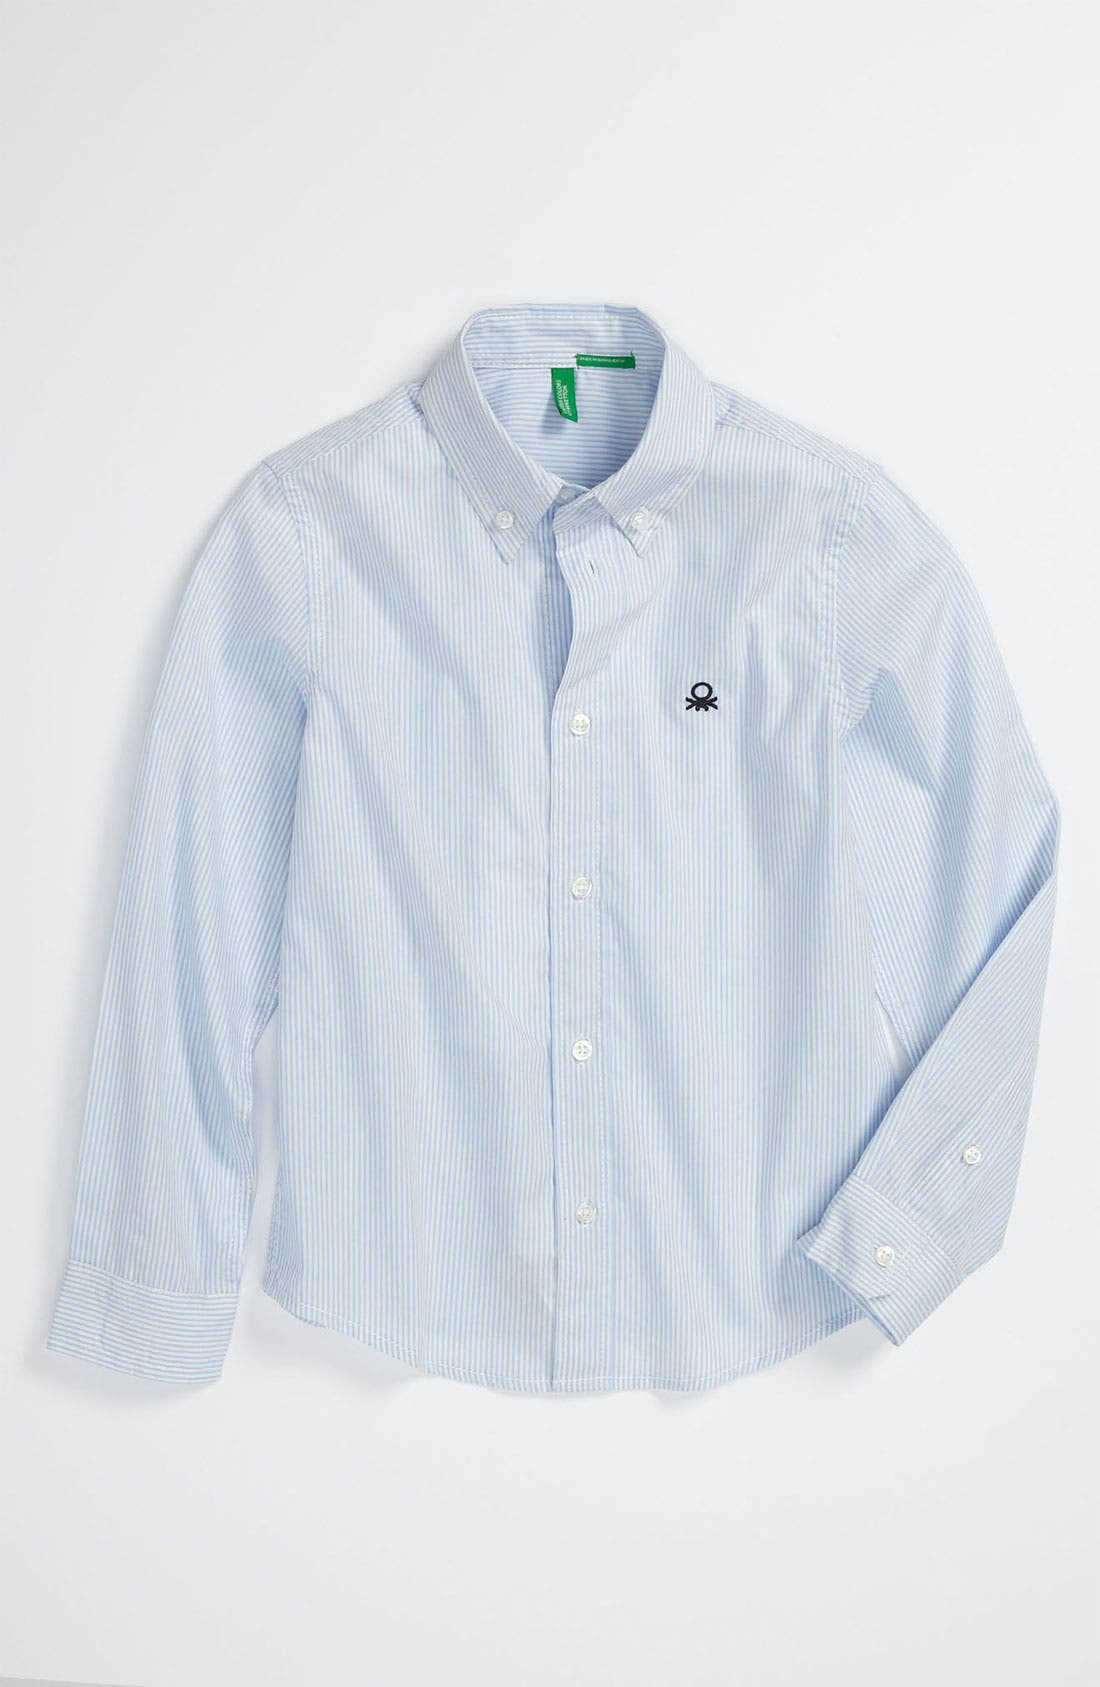 Main Image - United Colors of Benetton Kids Woven Shirt (Little Boys & Big Boys)